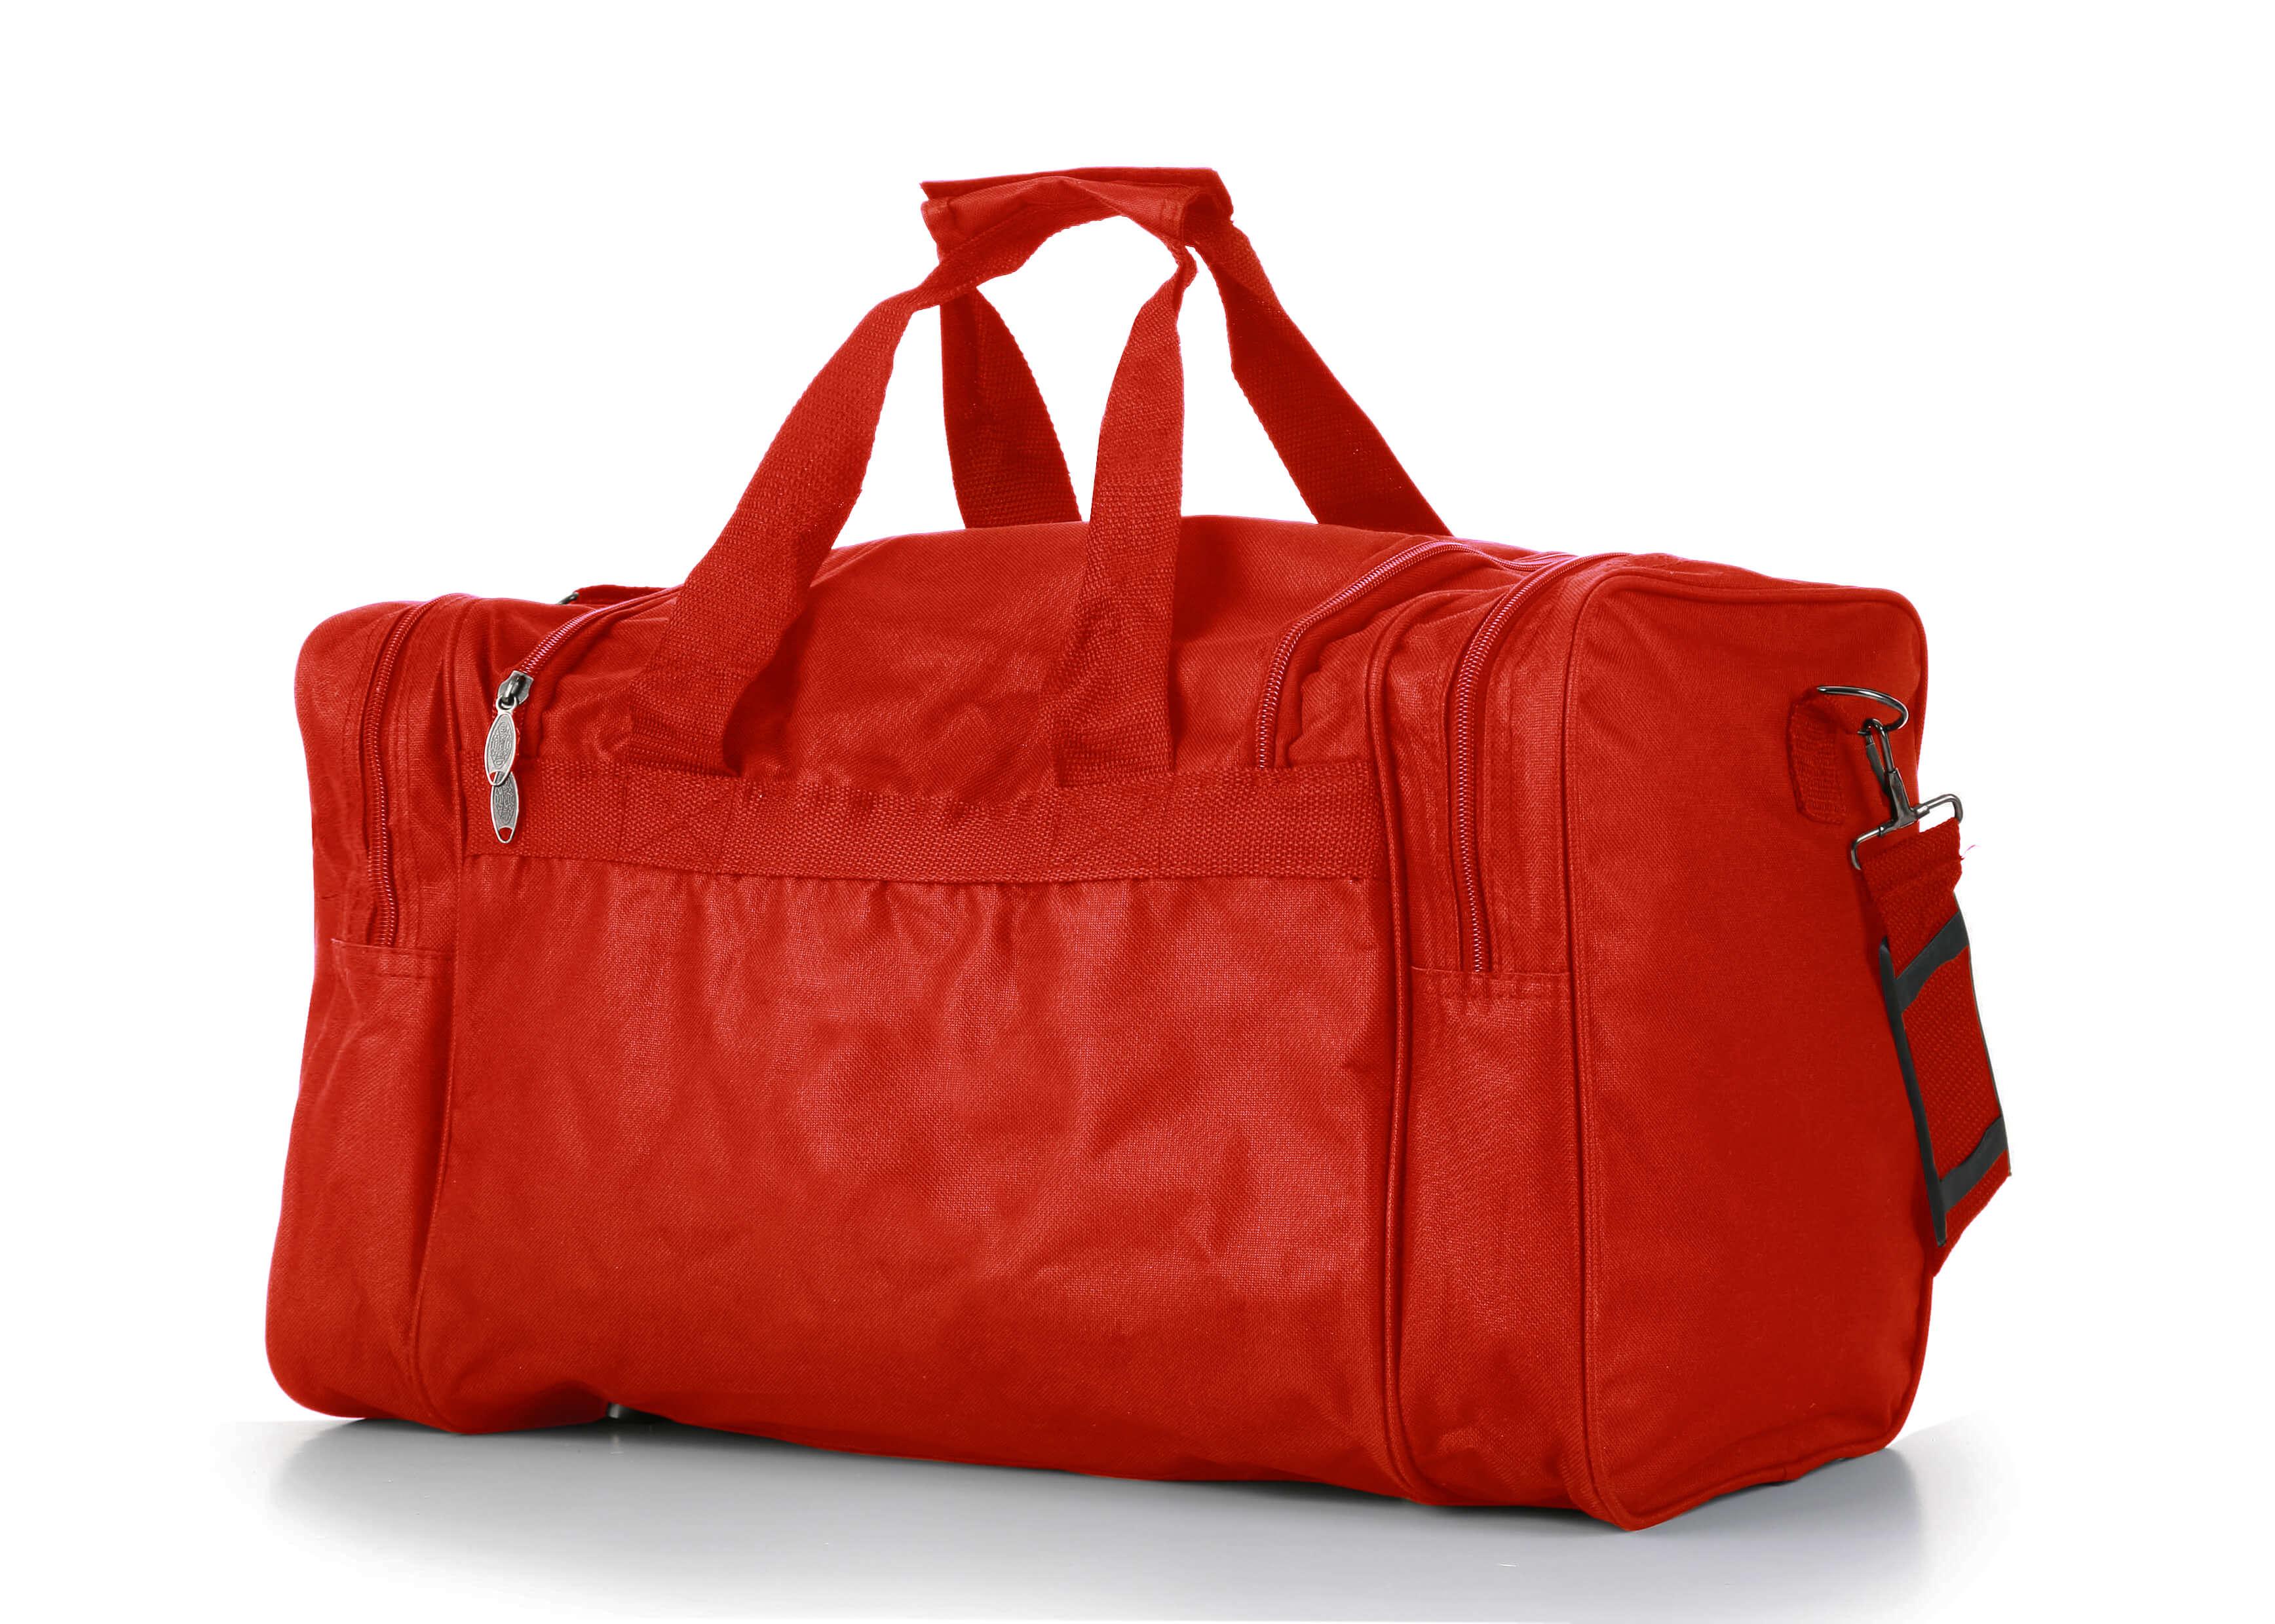 2e61402ed84 Polo Ralph Lauren Red Duffle Bag   ReGreen Springfield